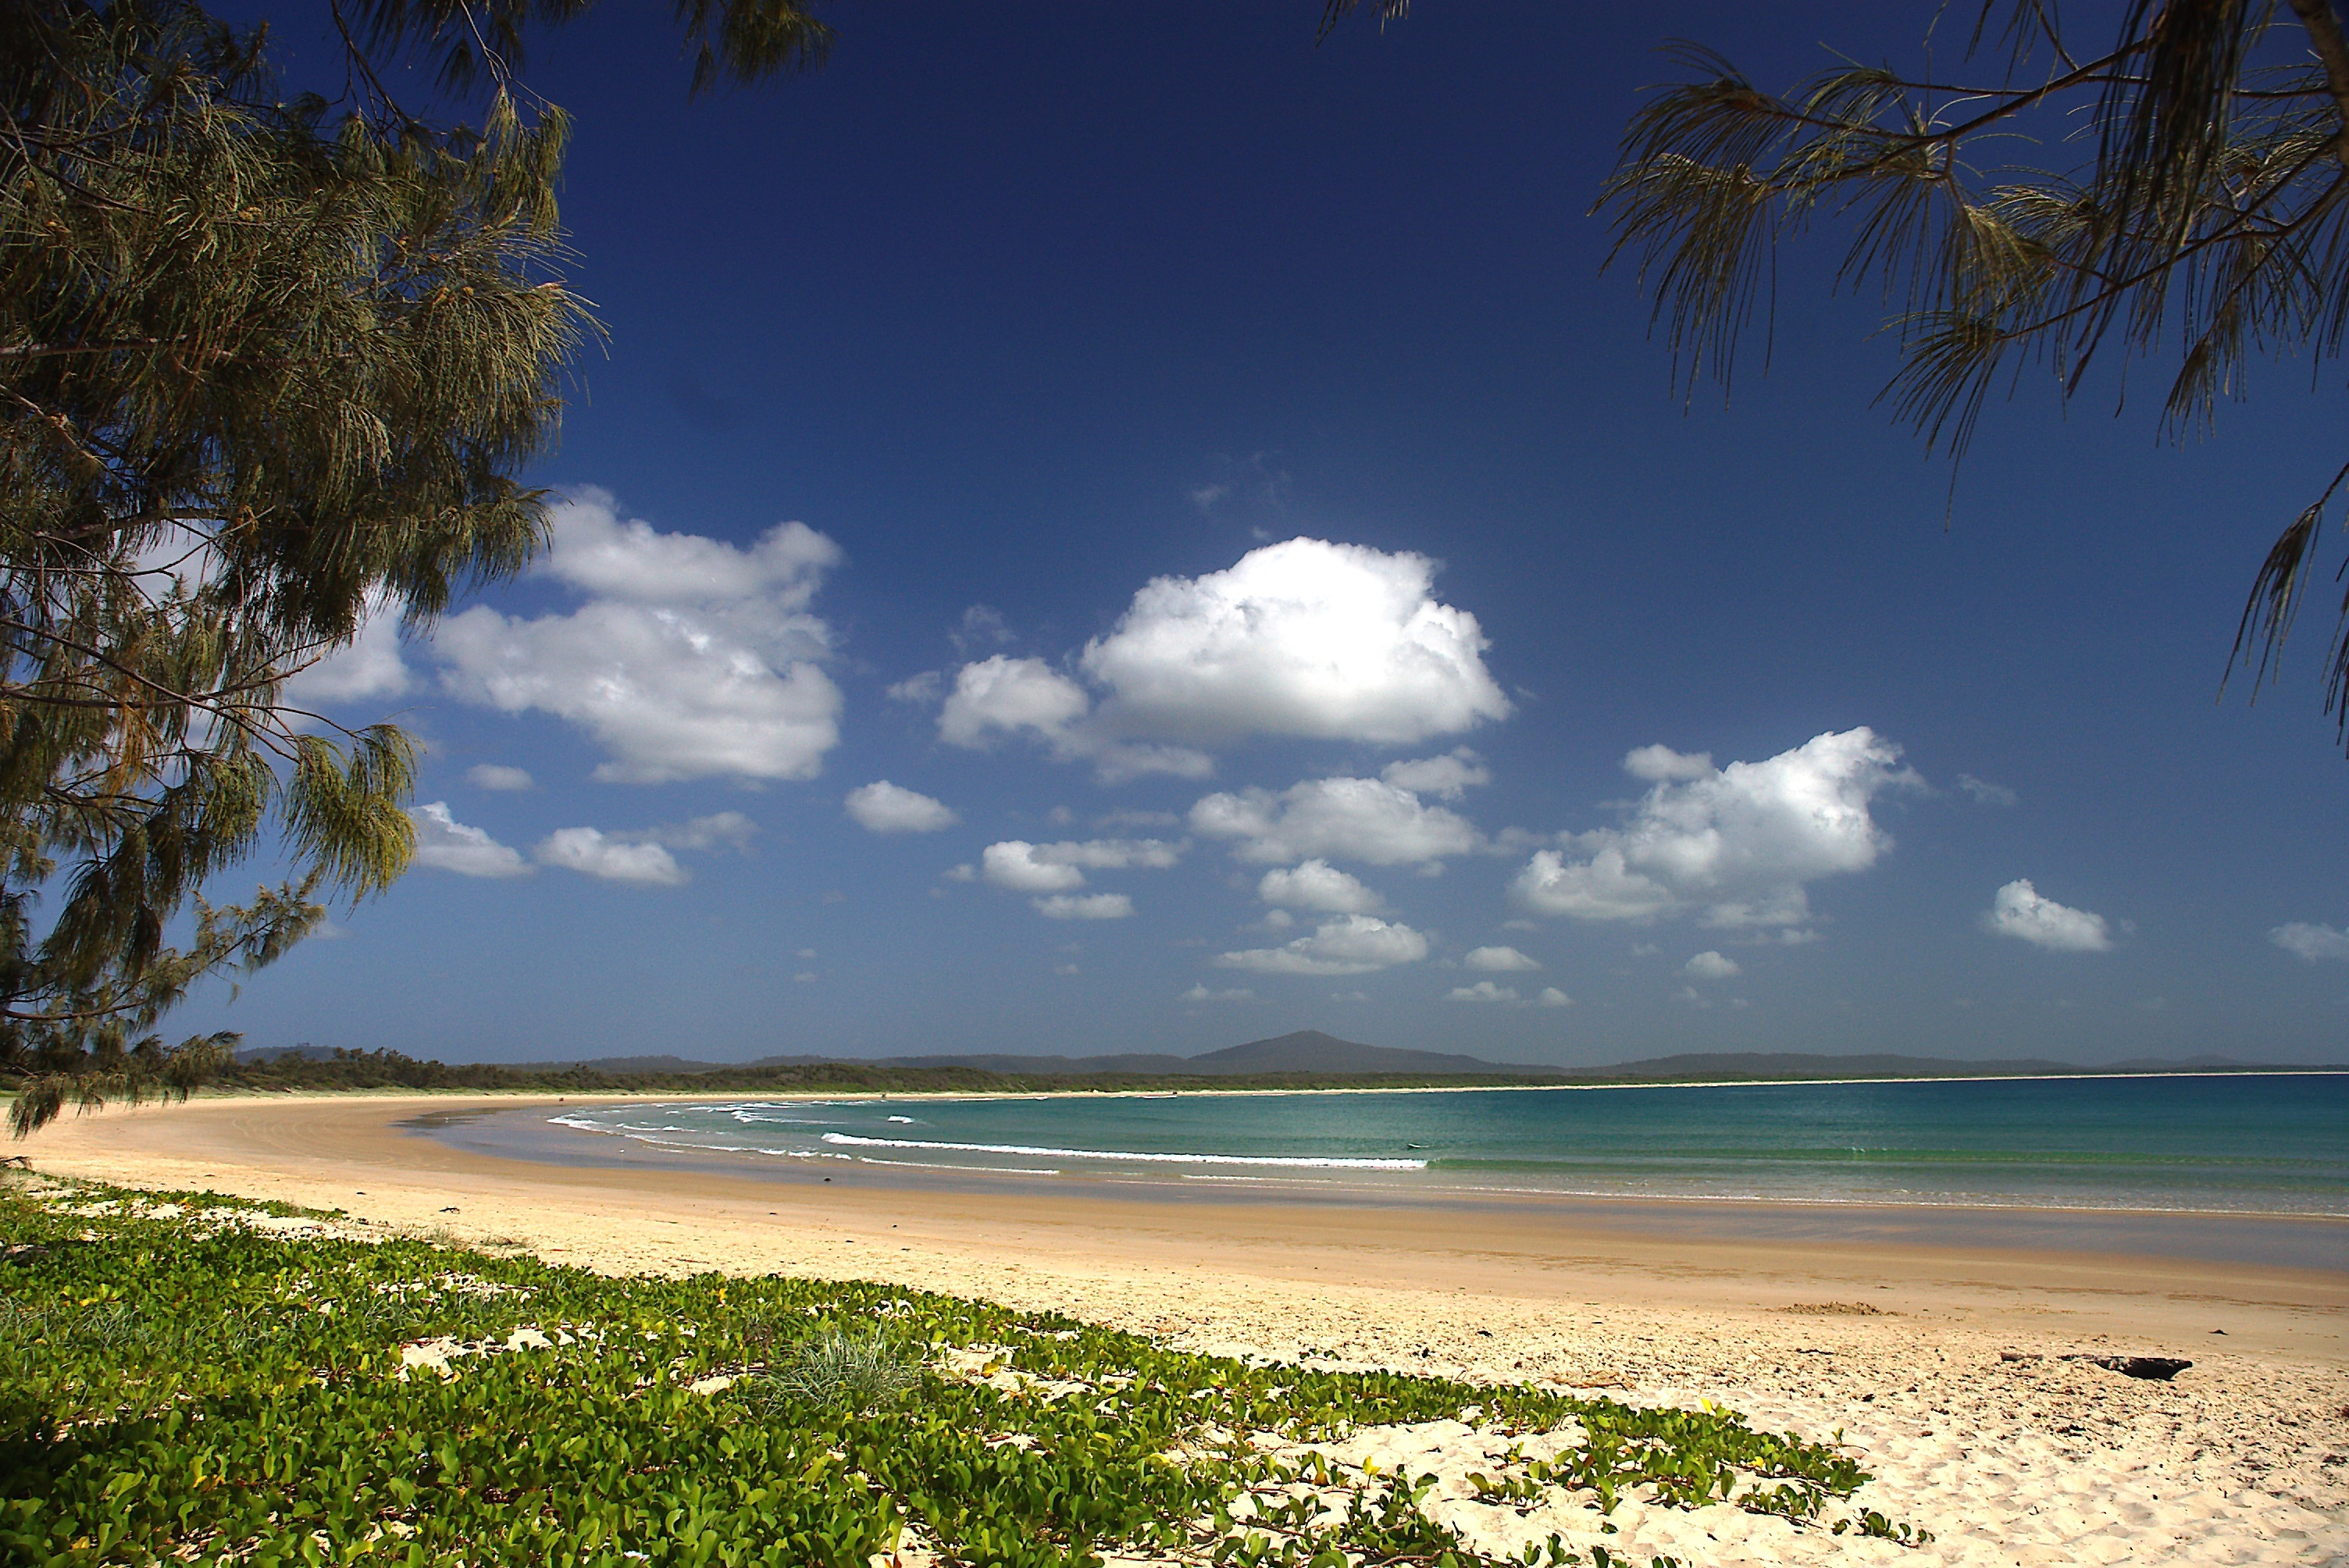 Toumbaal Beach